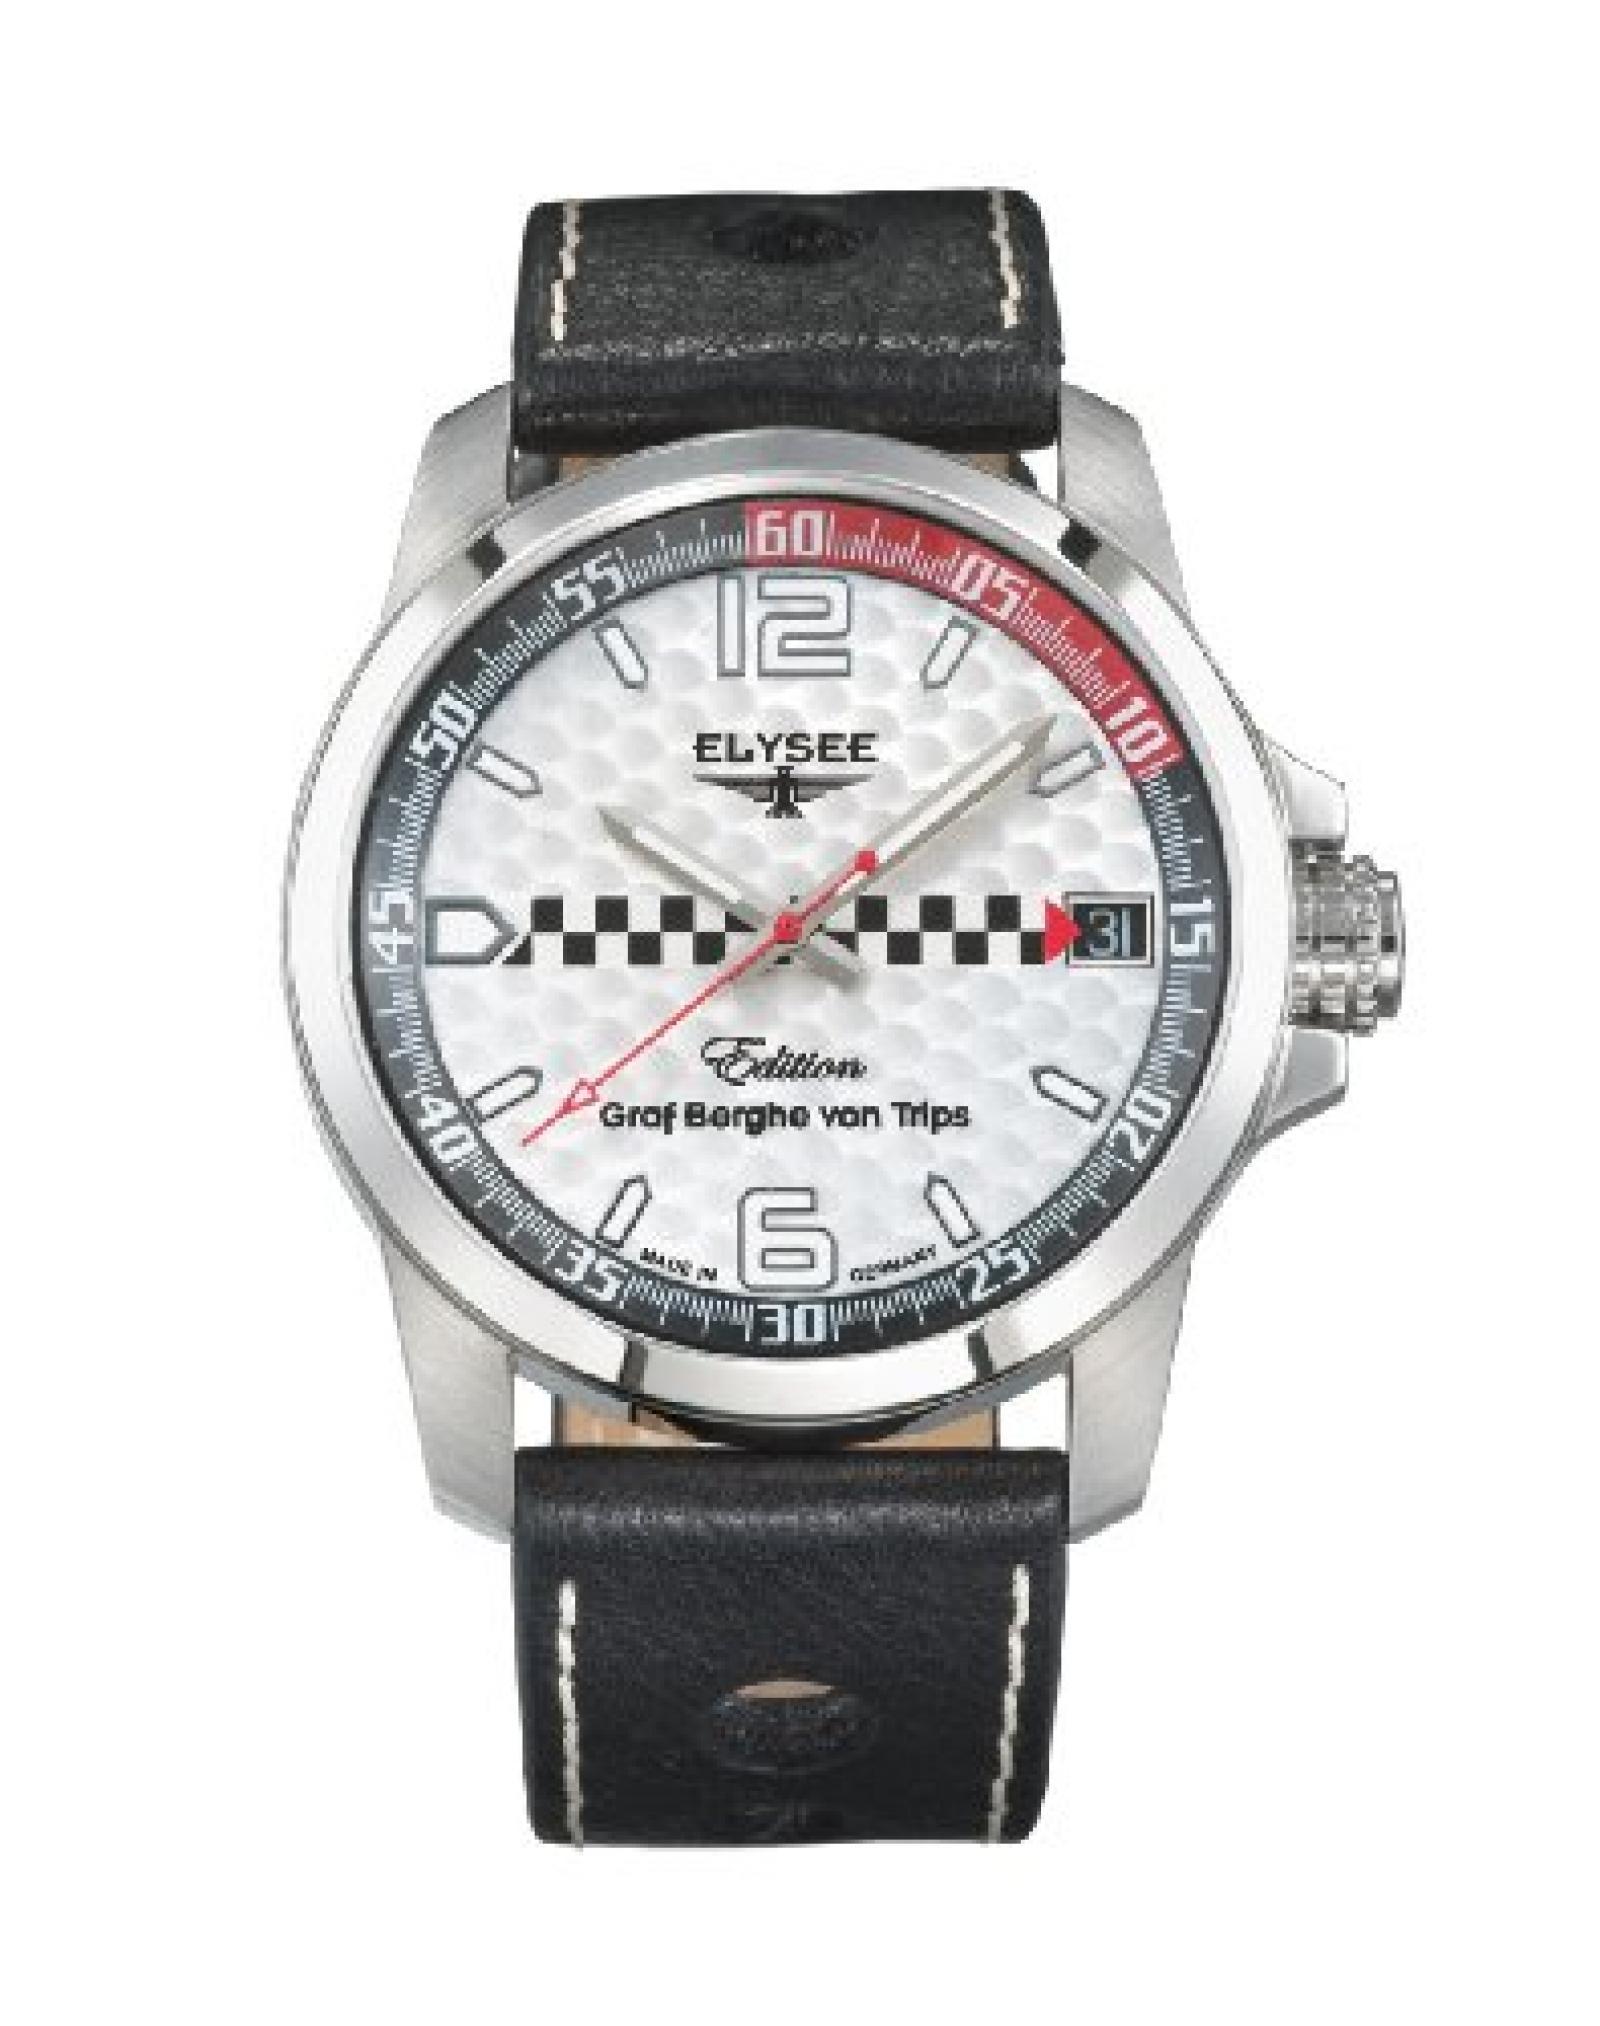 Elysee Herren-Armbanduhr Graf Berghe von Trips 80463